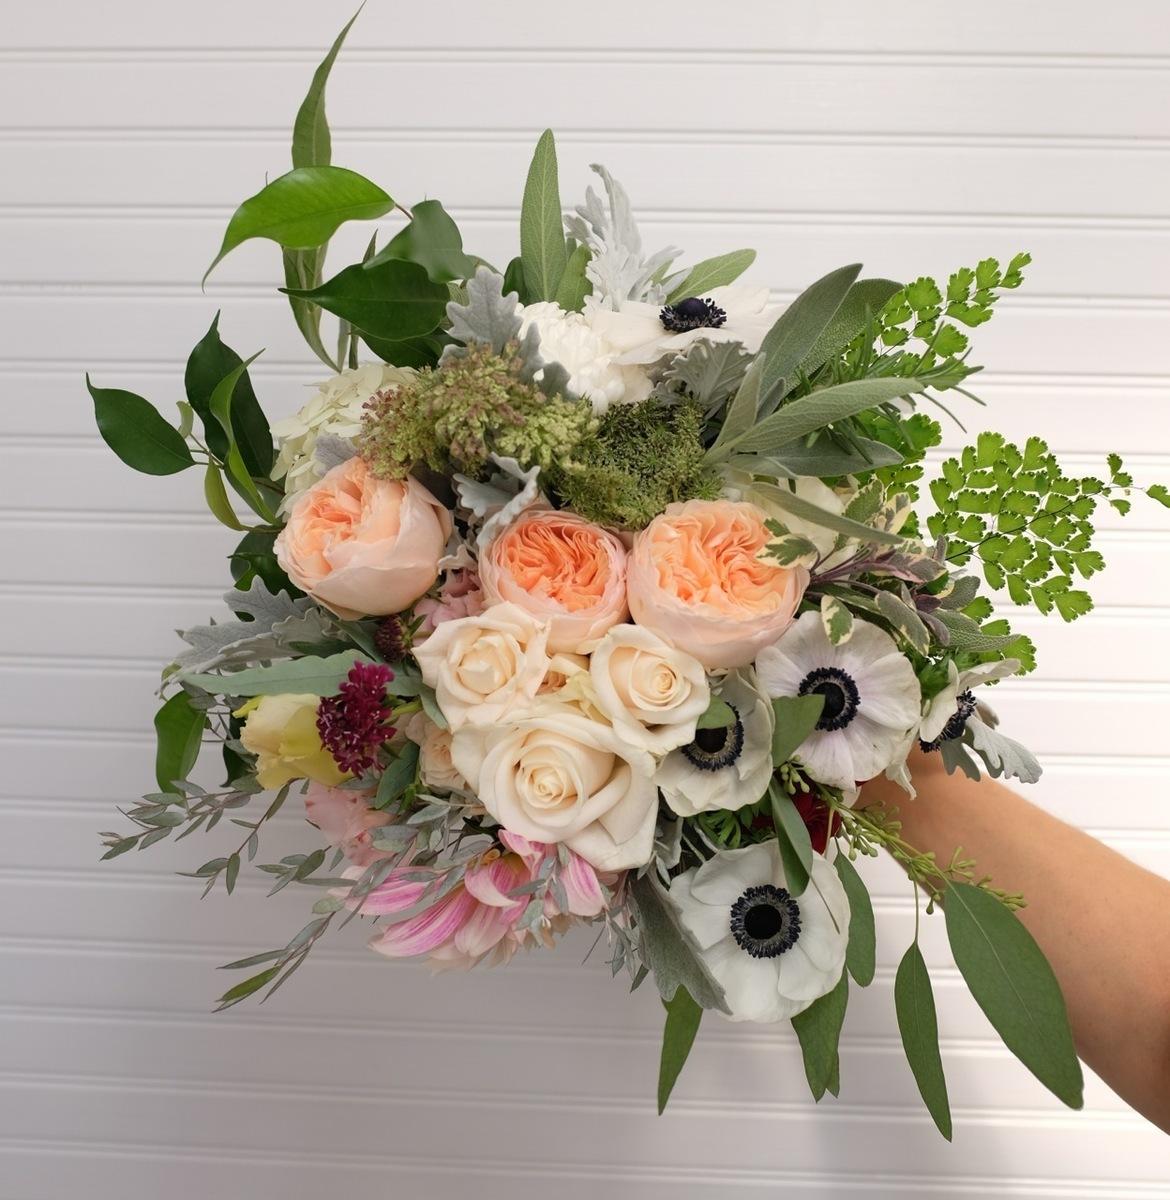 michler 39 s florist greenhouses garden design reviews ratings wedding flowers kentucky. Black Bedroom Furniture Sets. Home Design Ideas